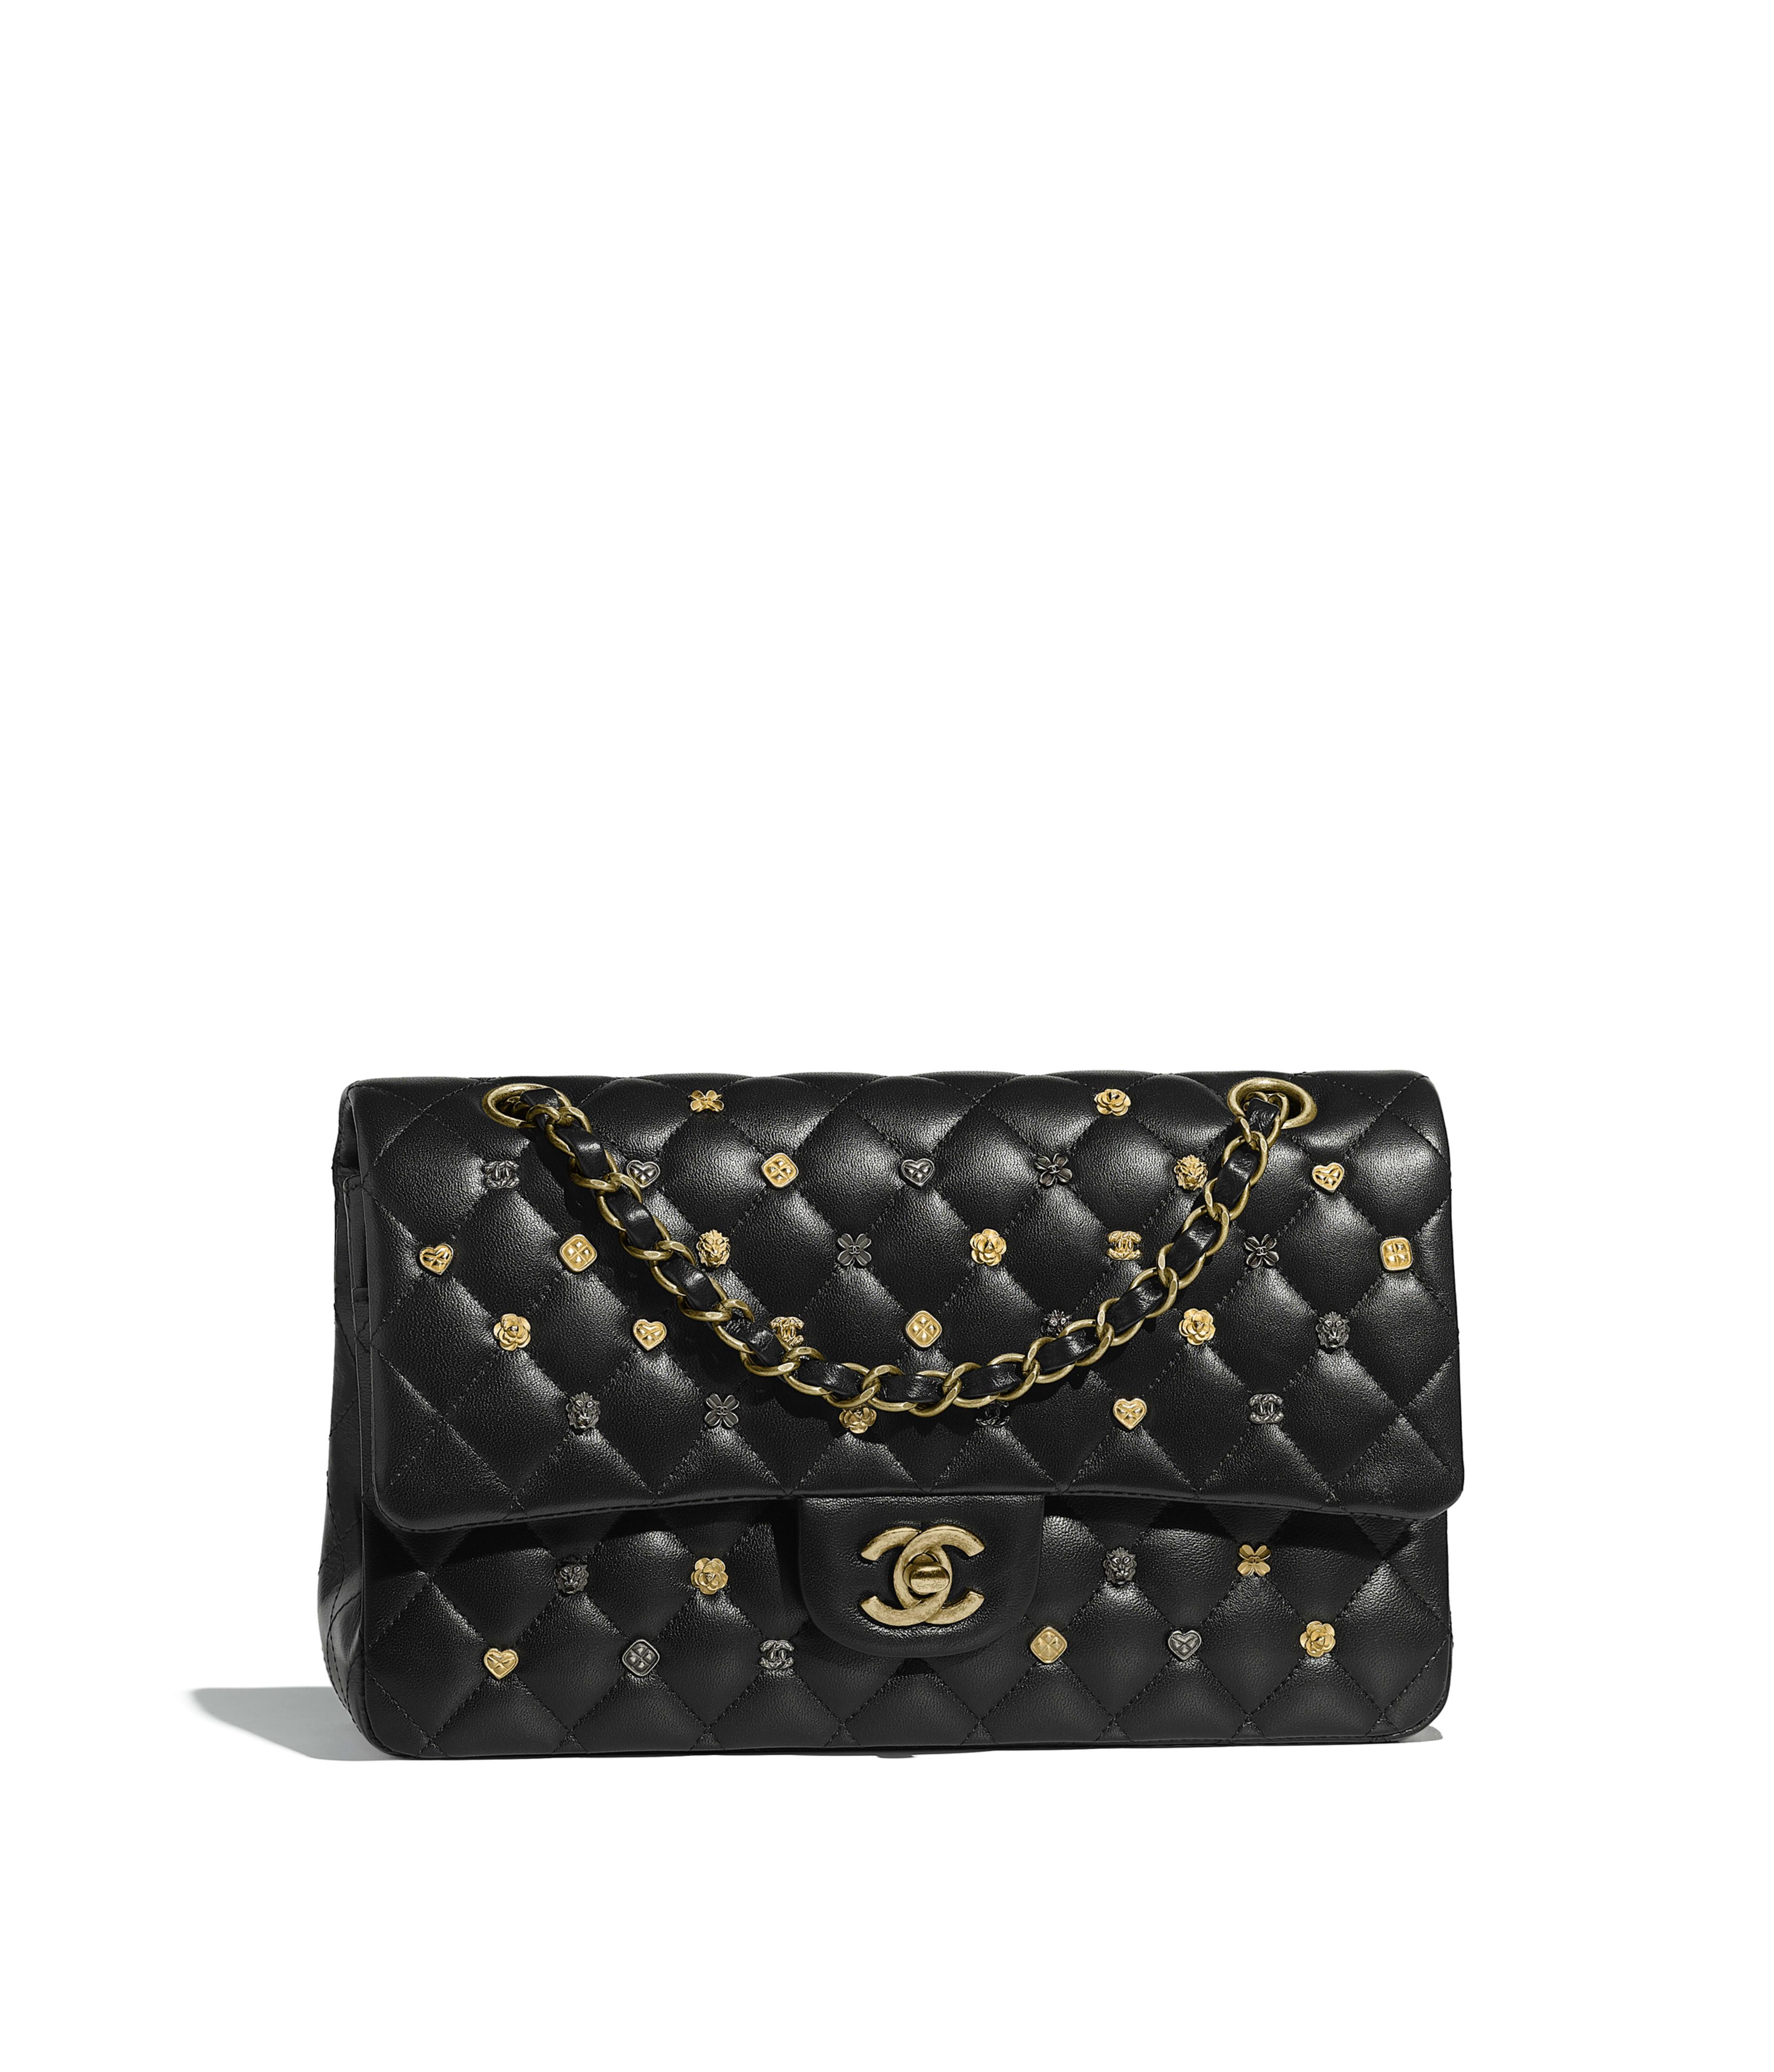 a1cbb01fcdc Classic Handbag Lambskin, Gold-Tone   Ruthenium-Finish Metal, Black Ref.  A01112Y8404994305